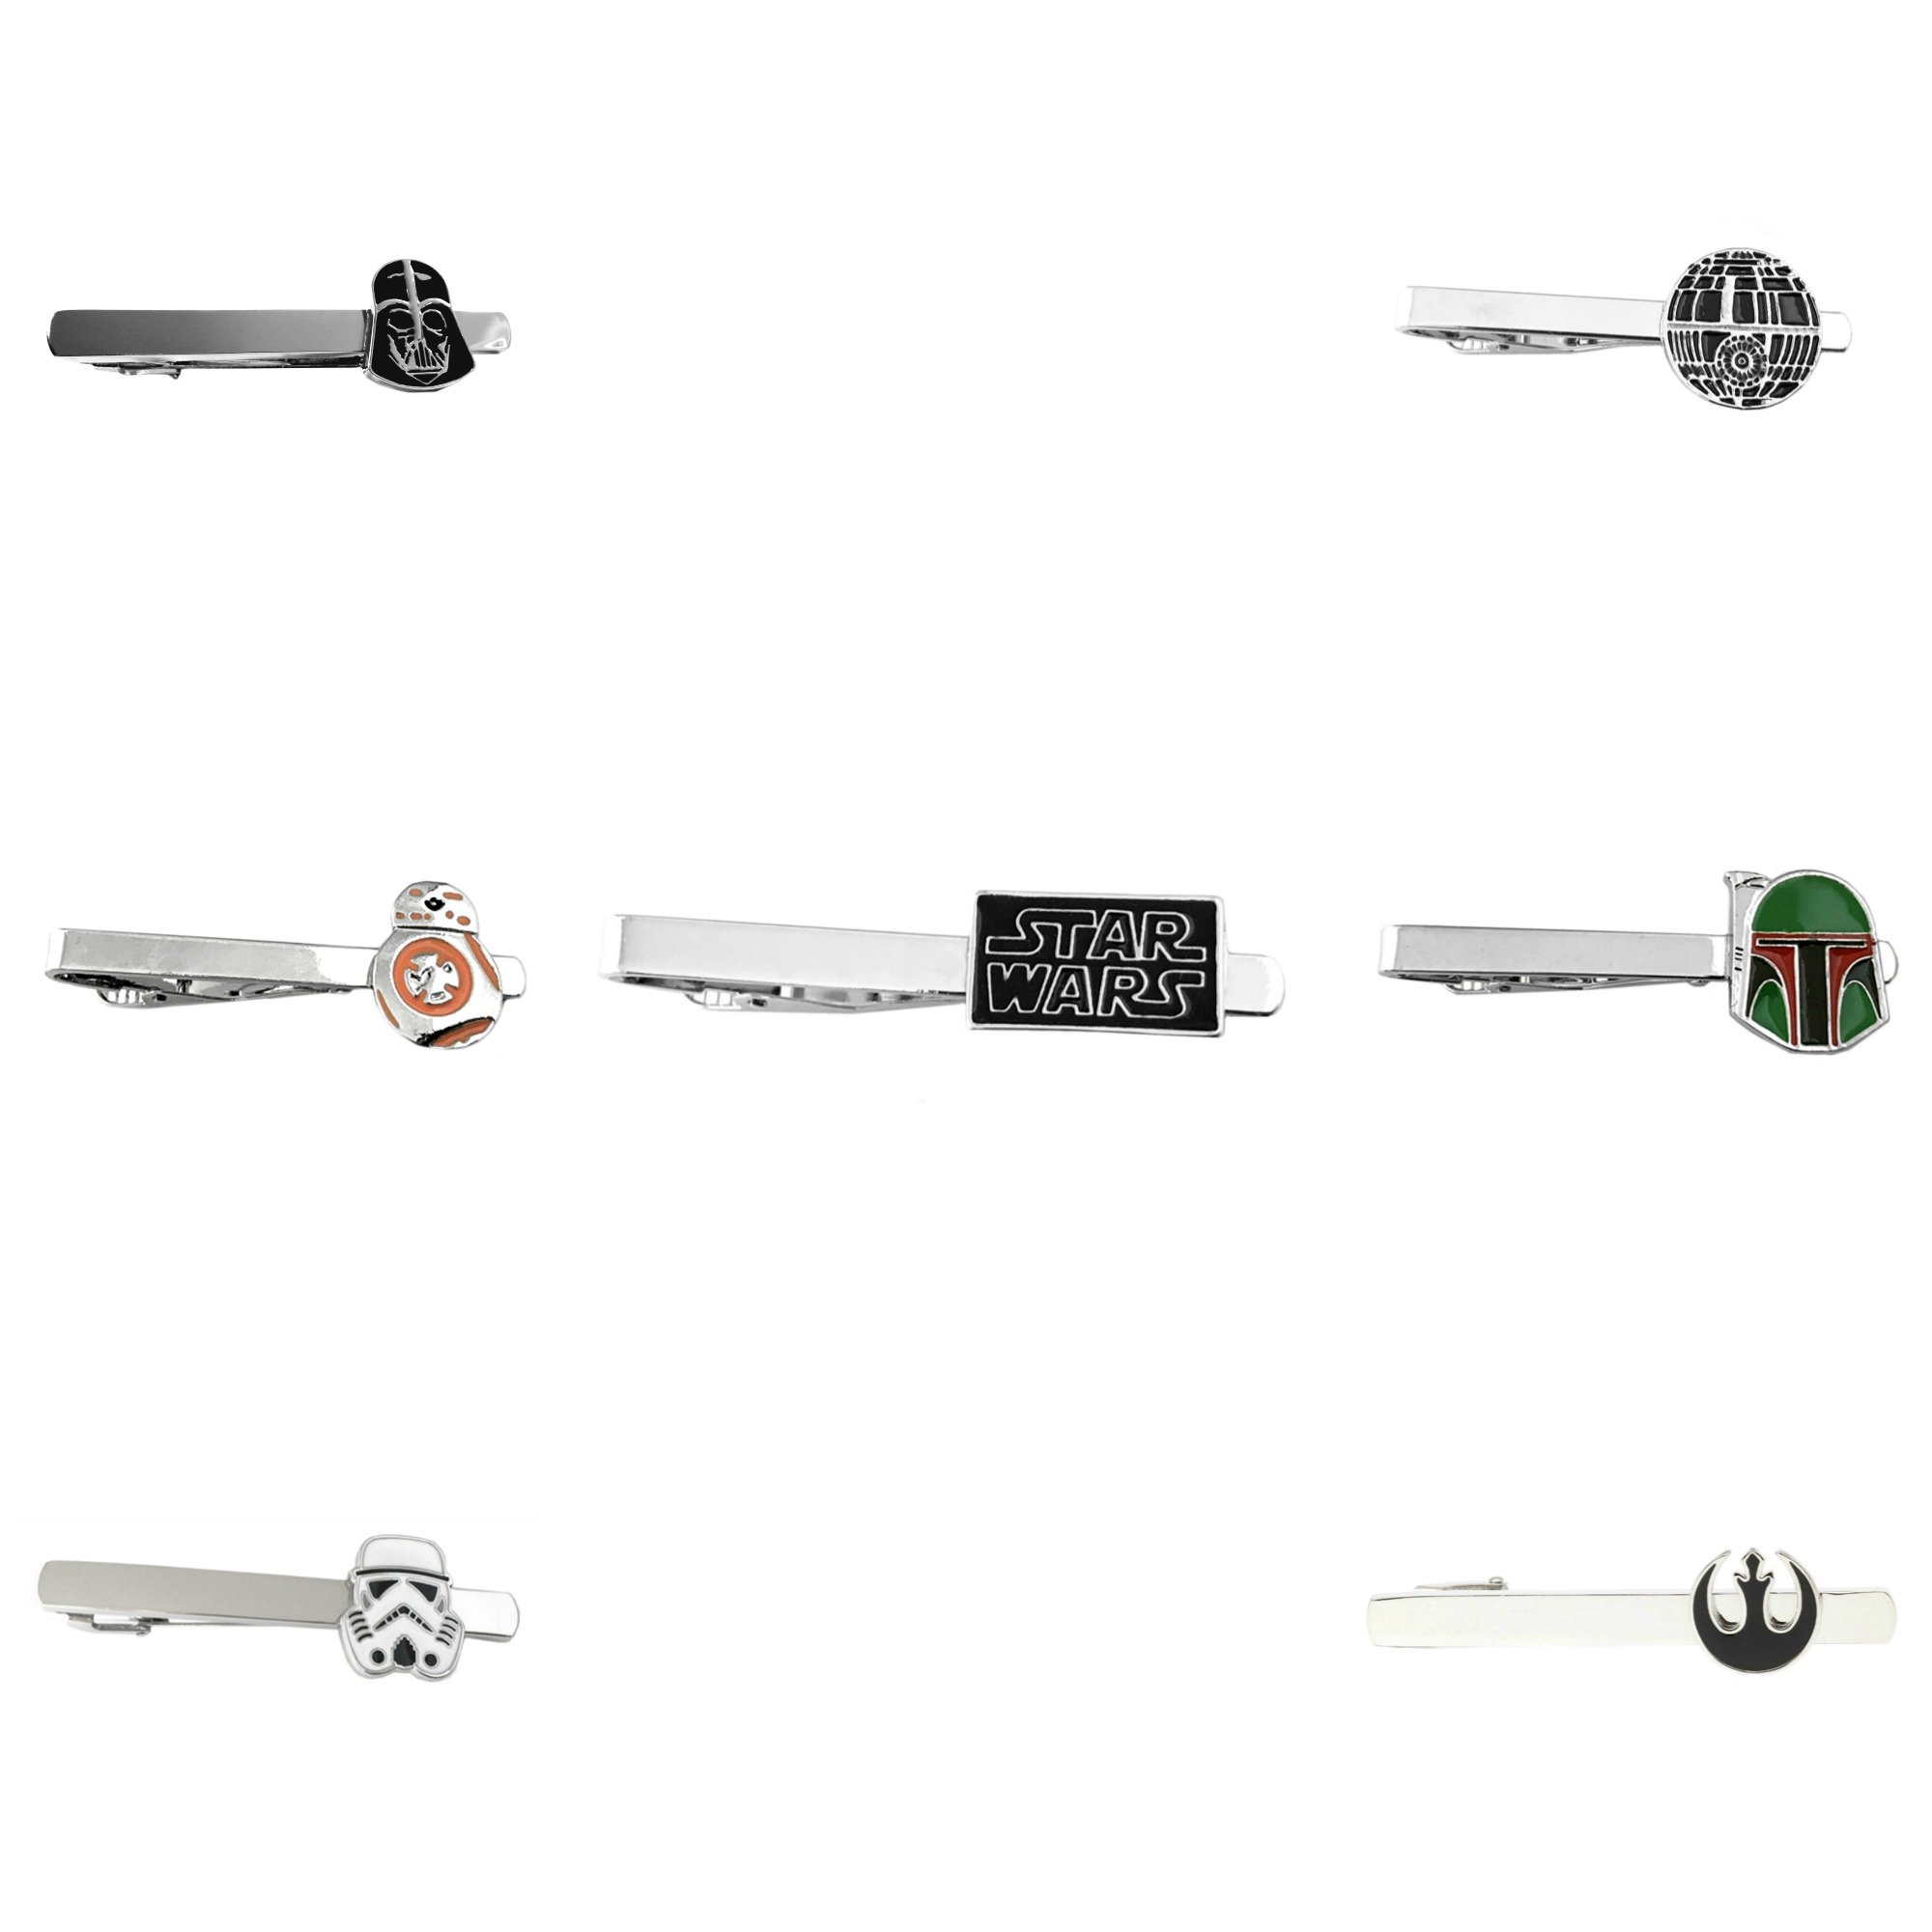 Outlander Star Wars - Star Wars Assorted- Tiebar Tie Clasp Set of 7 Wedding Superhero Logo w/Gift Box